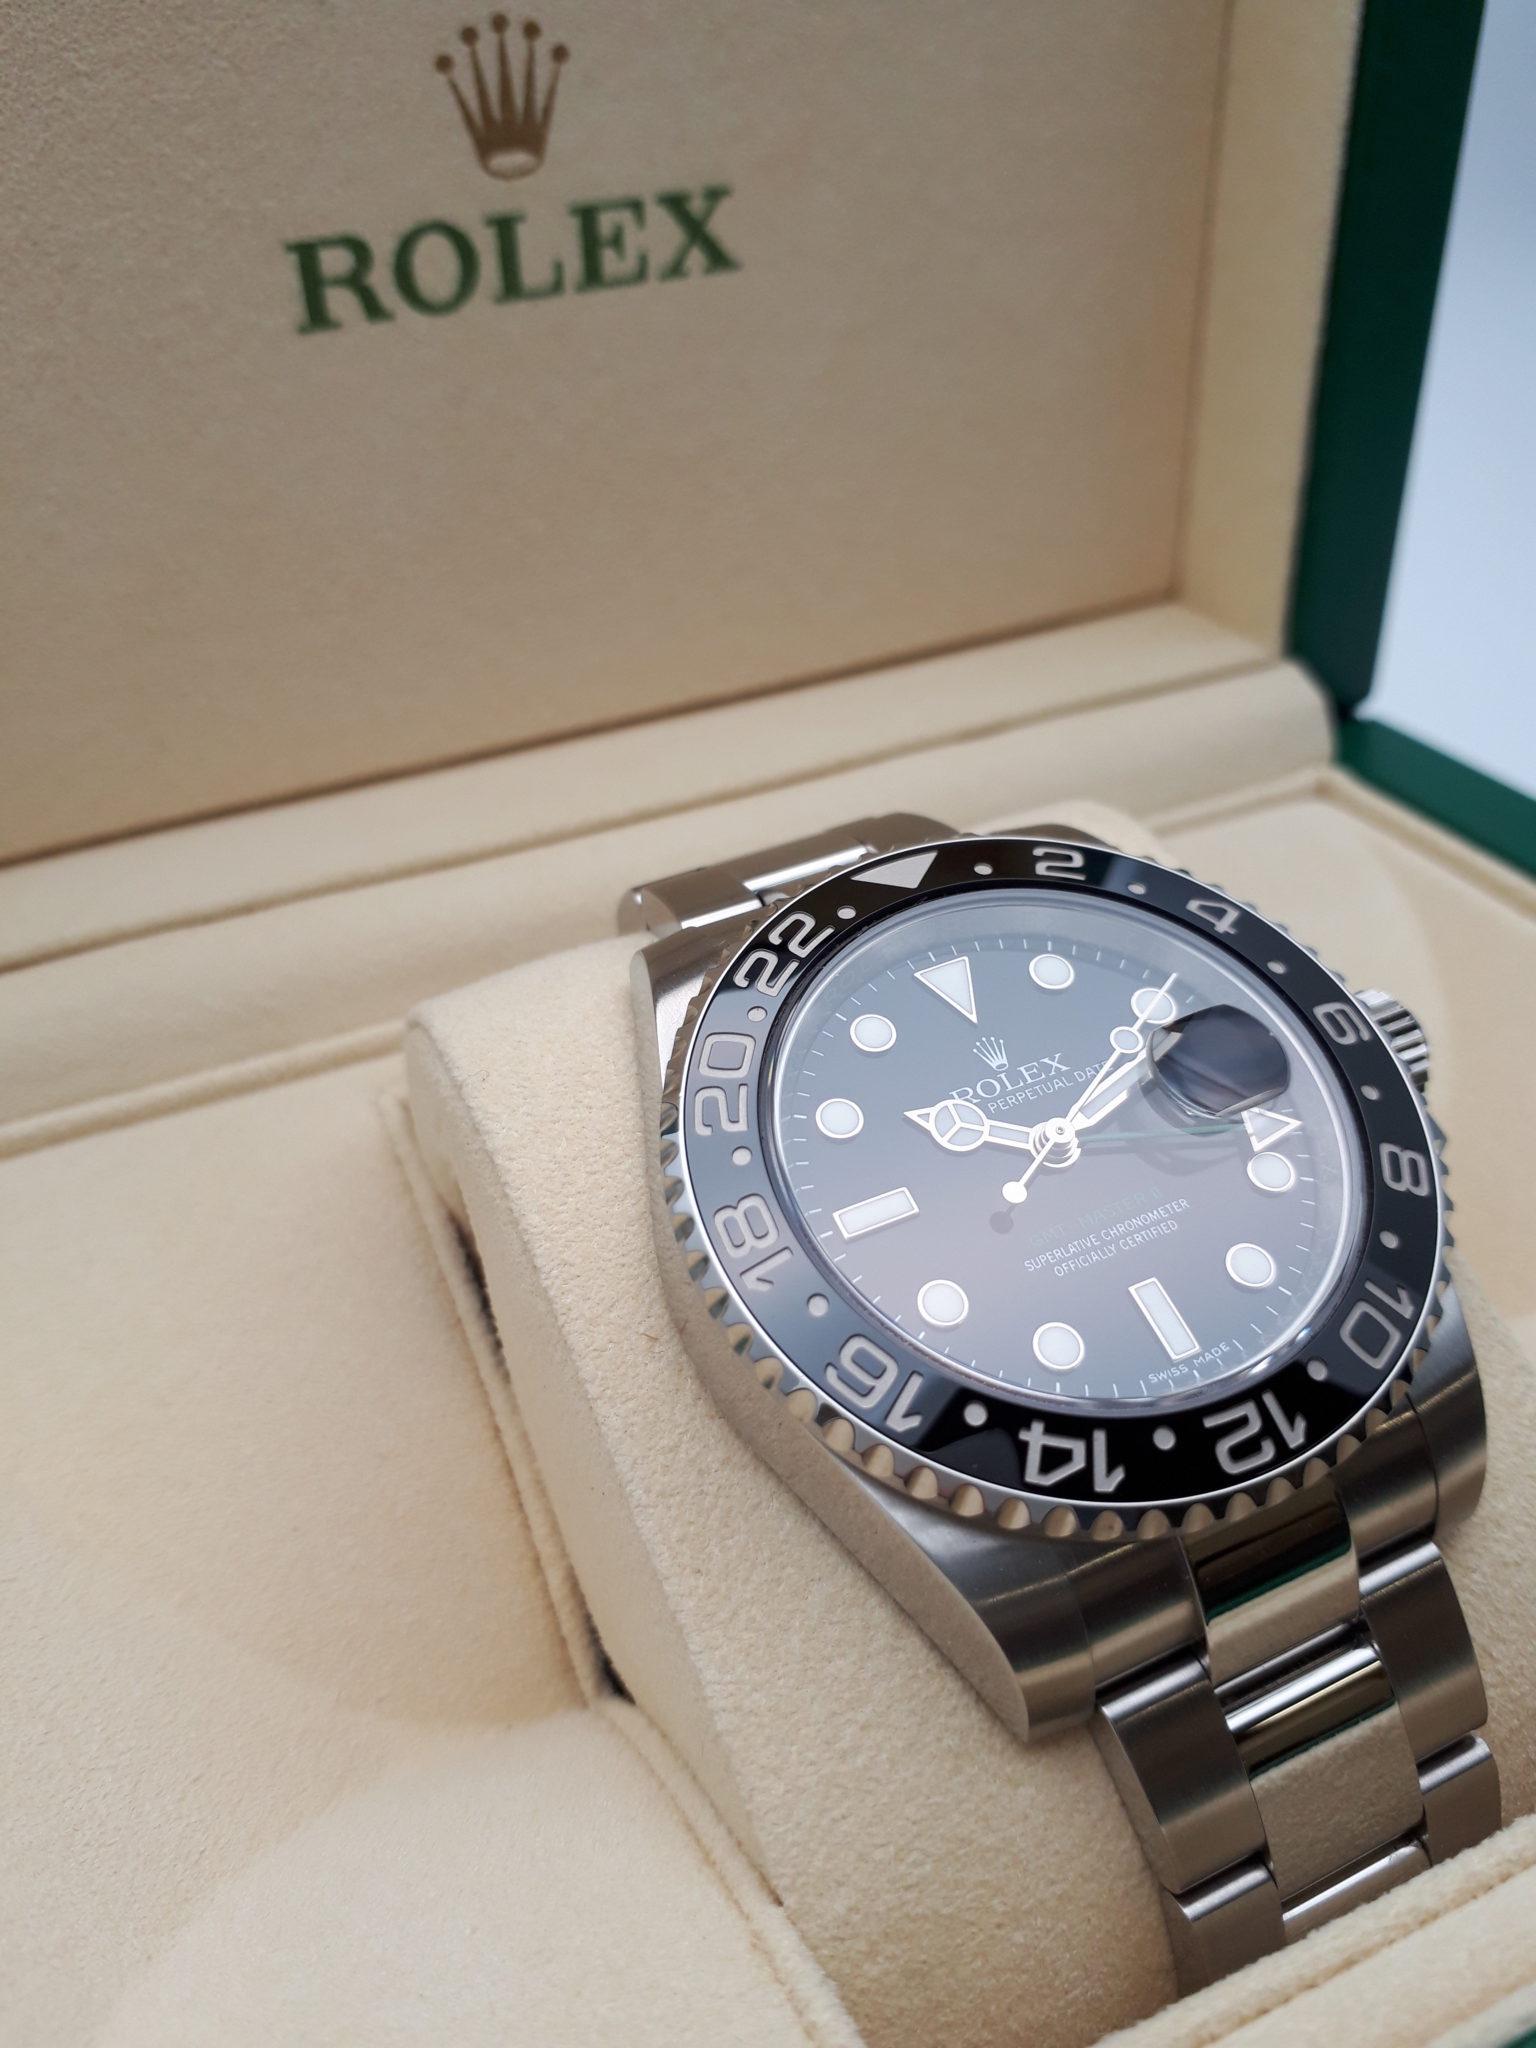 【ROLEX GMTマスター2 116710LN ランダム番】を盛岡市のお客様よりお買取させていただきました。